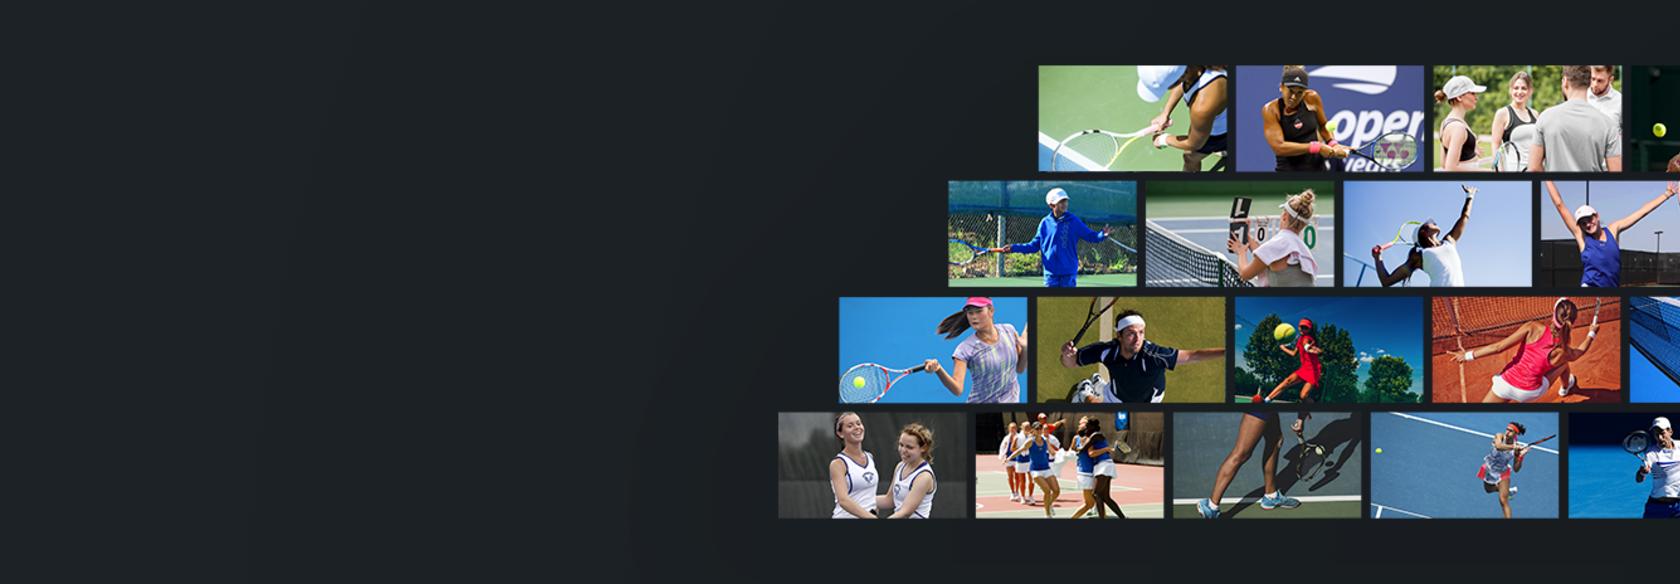 b668eb53fe1eb Your Tennis World Just Got Even Better